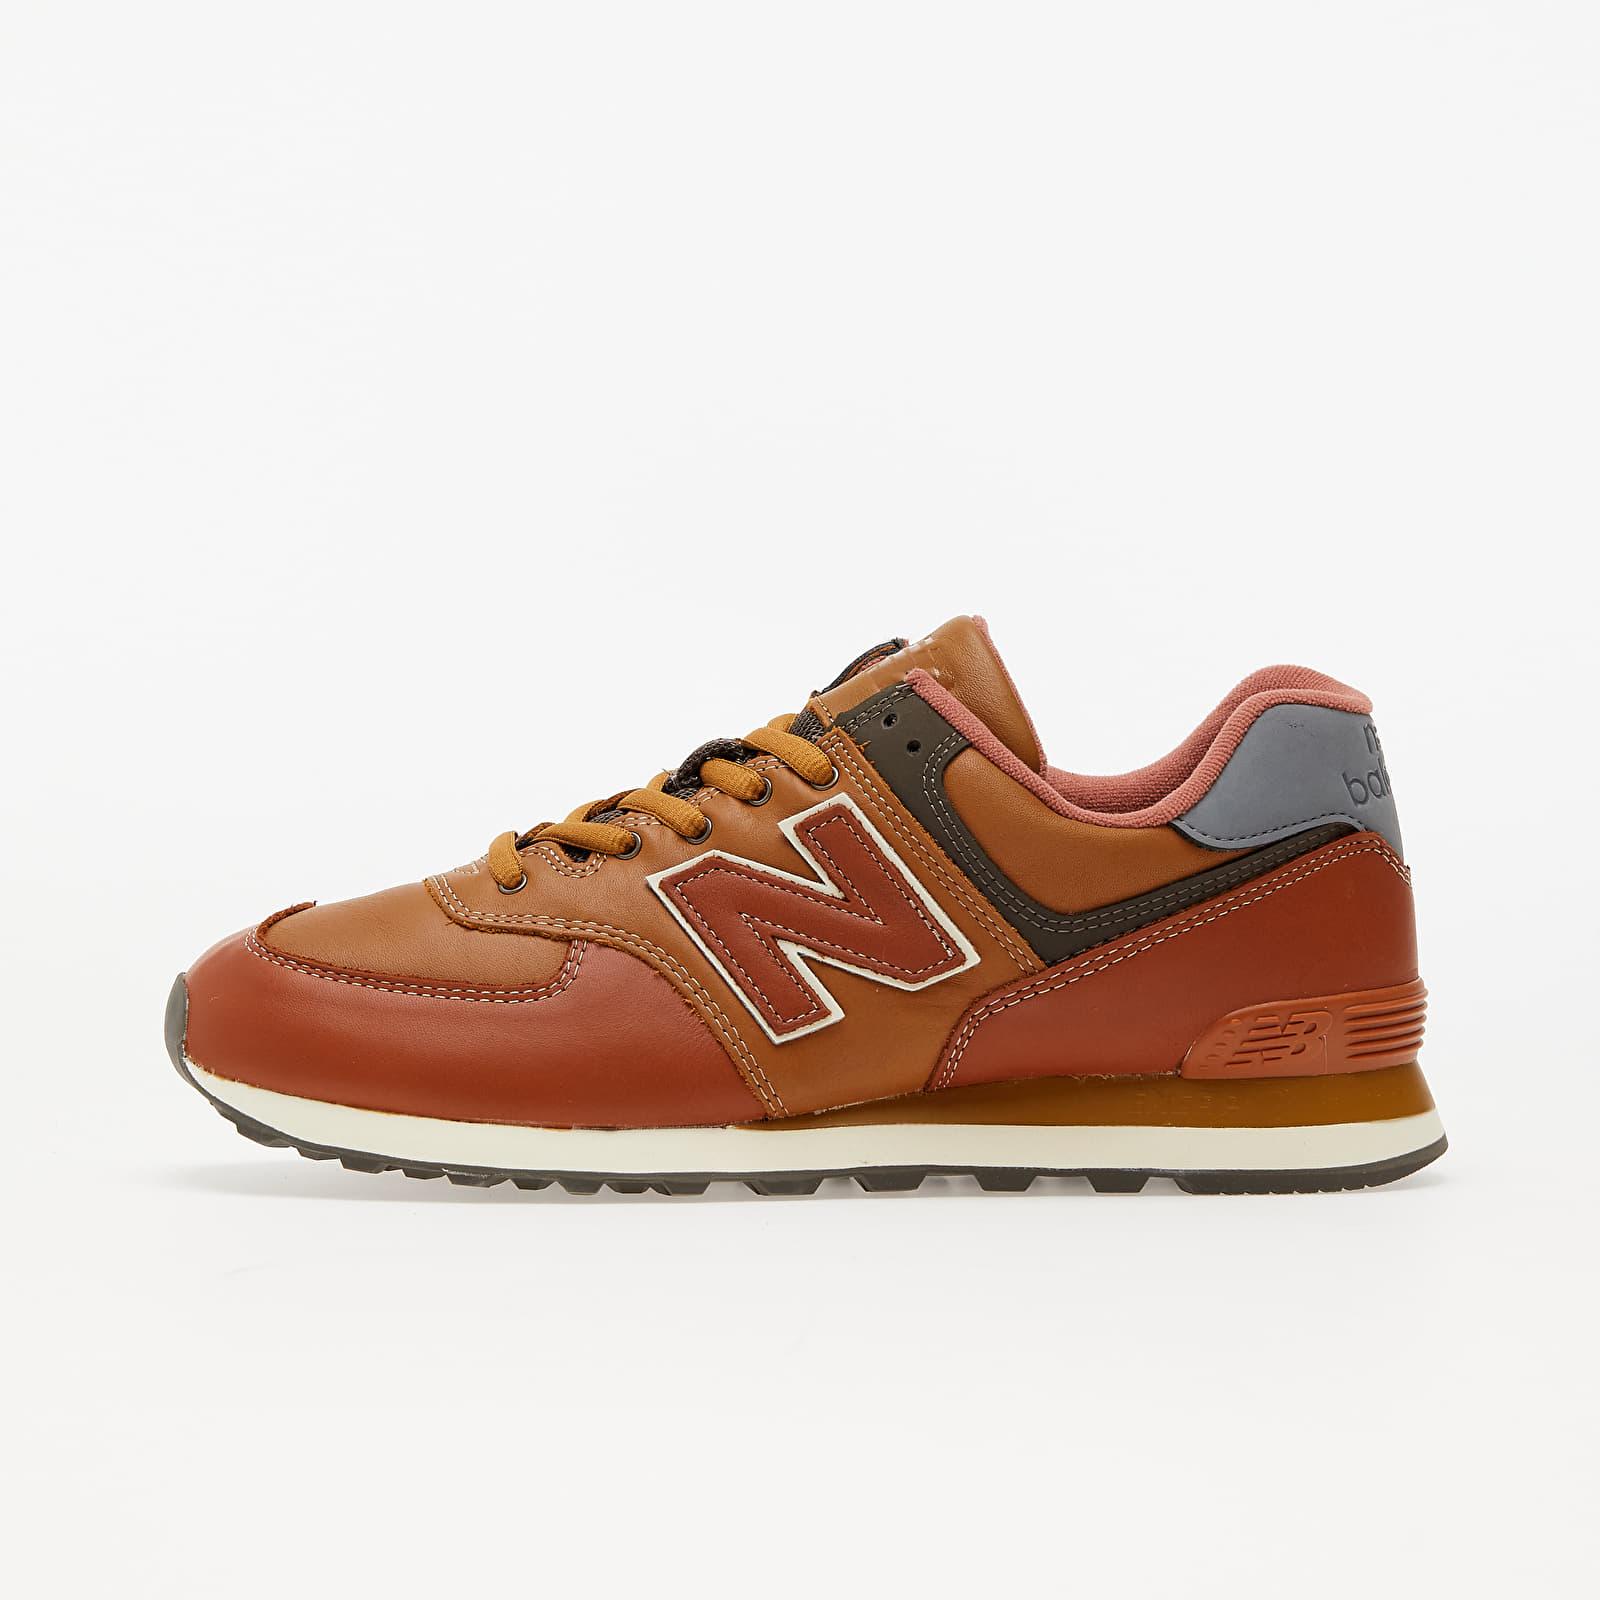 New Balance 574 Brown EUR 44